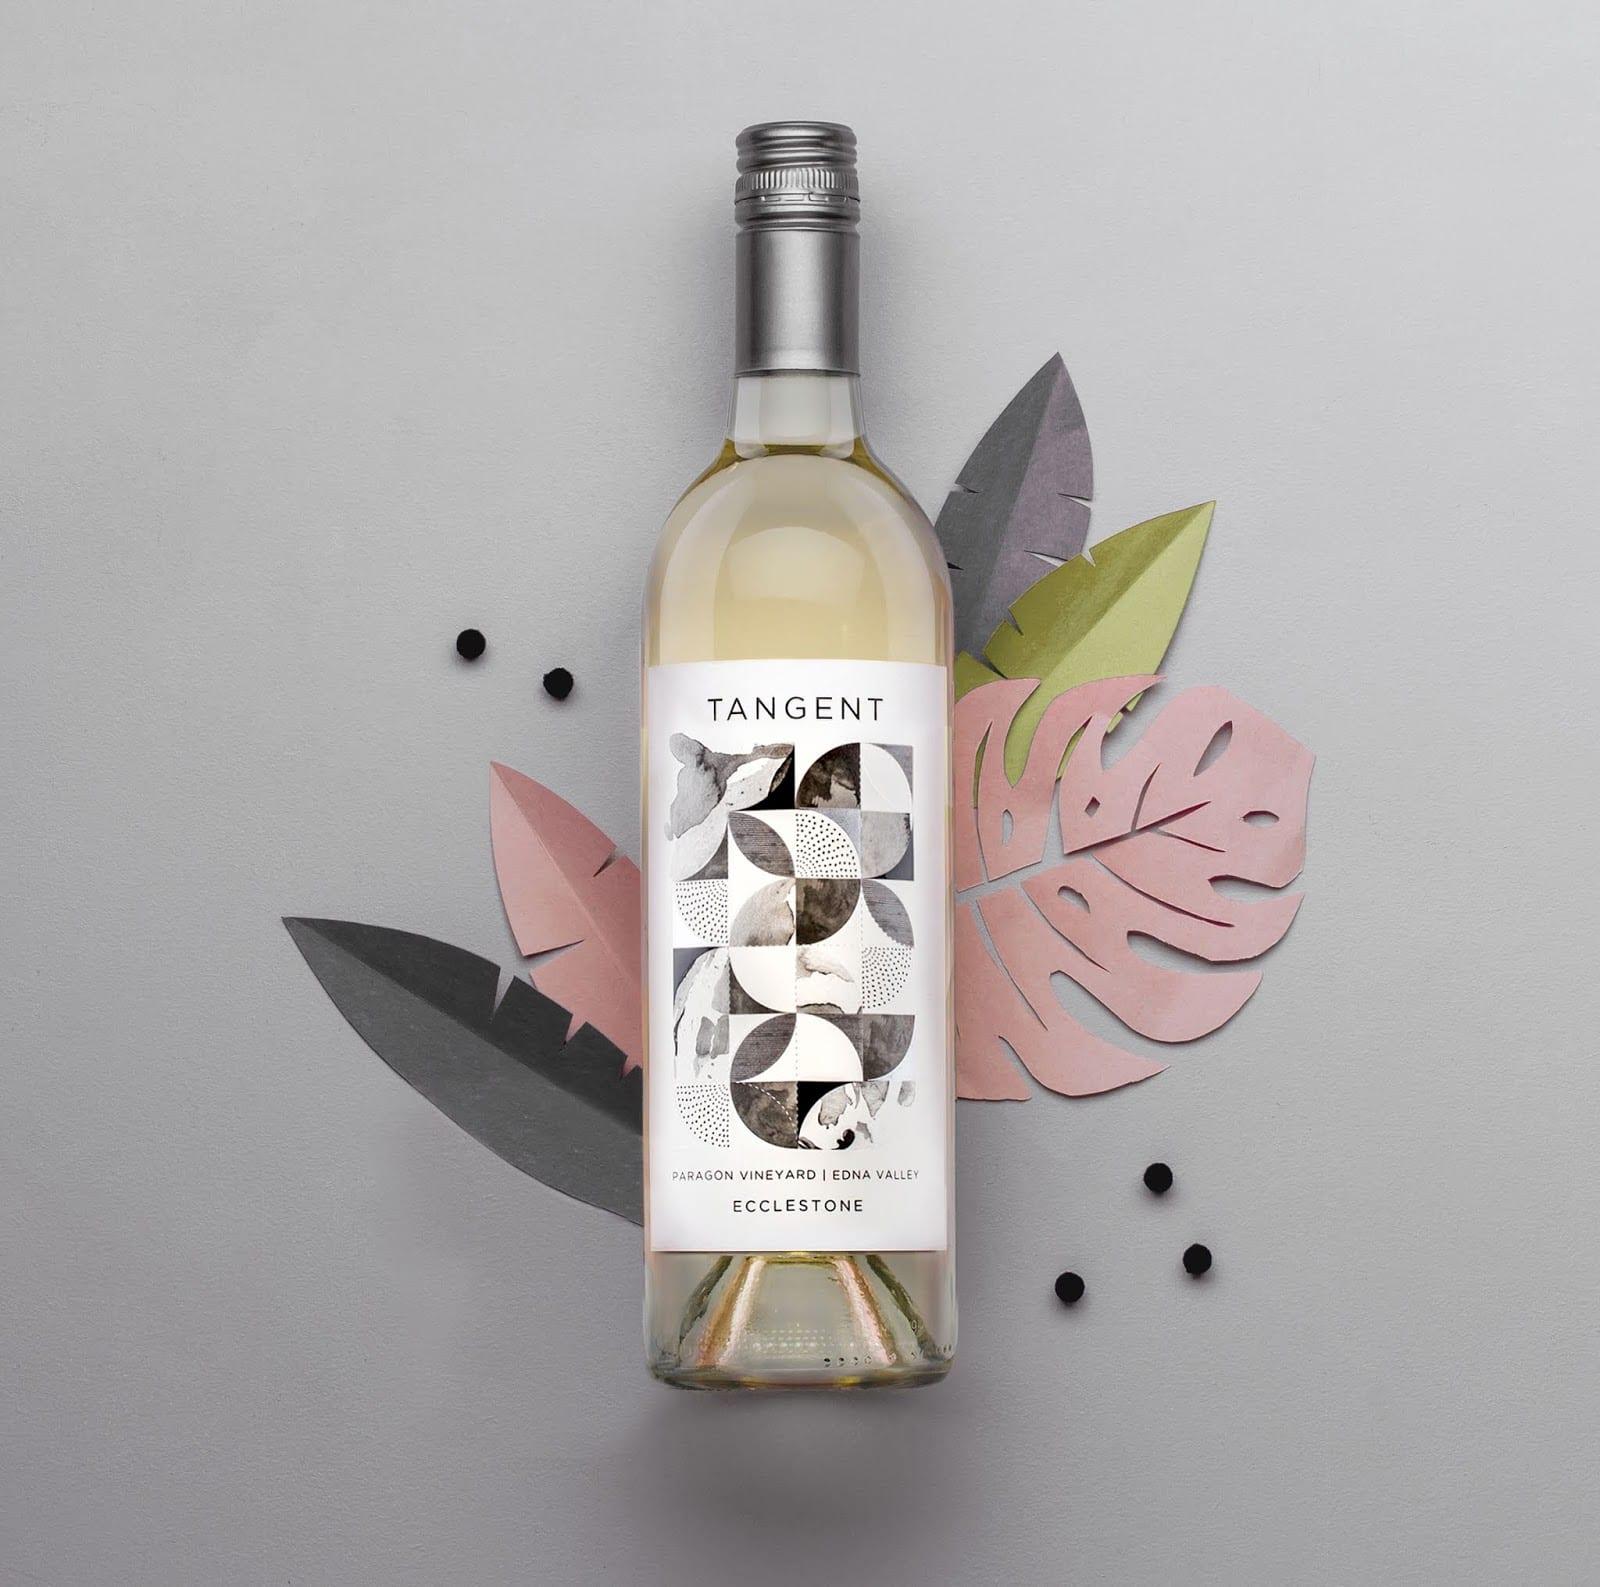 TANGENT img 4 - Redesign obalu Tangent Wines, populárních vín z Kalifornie